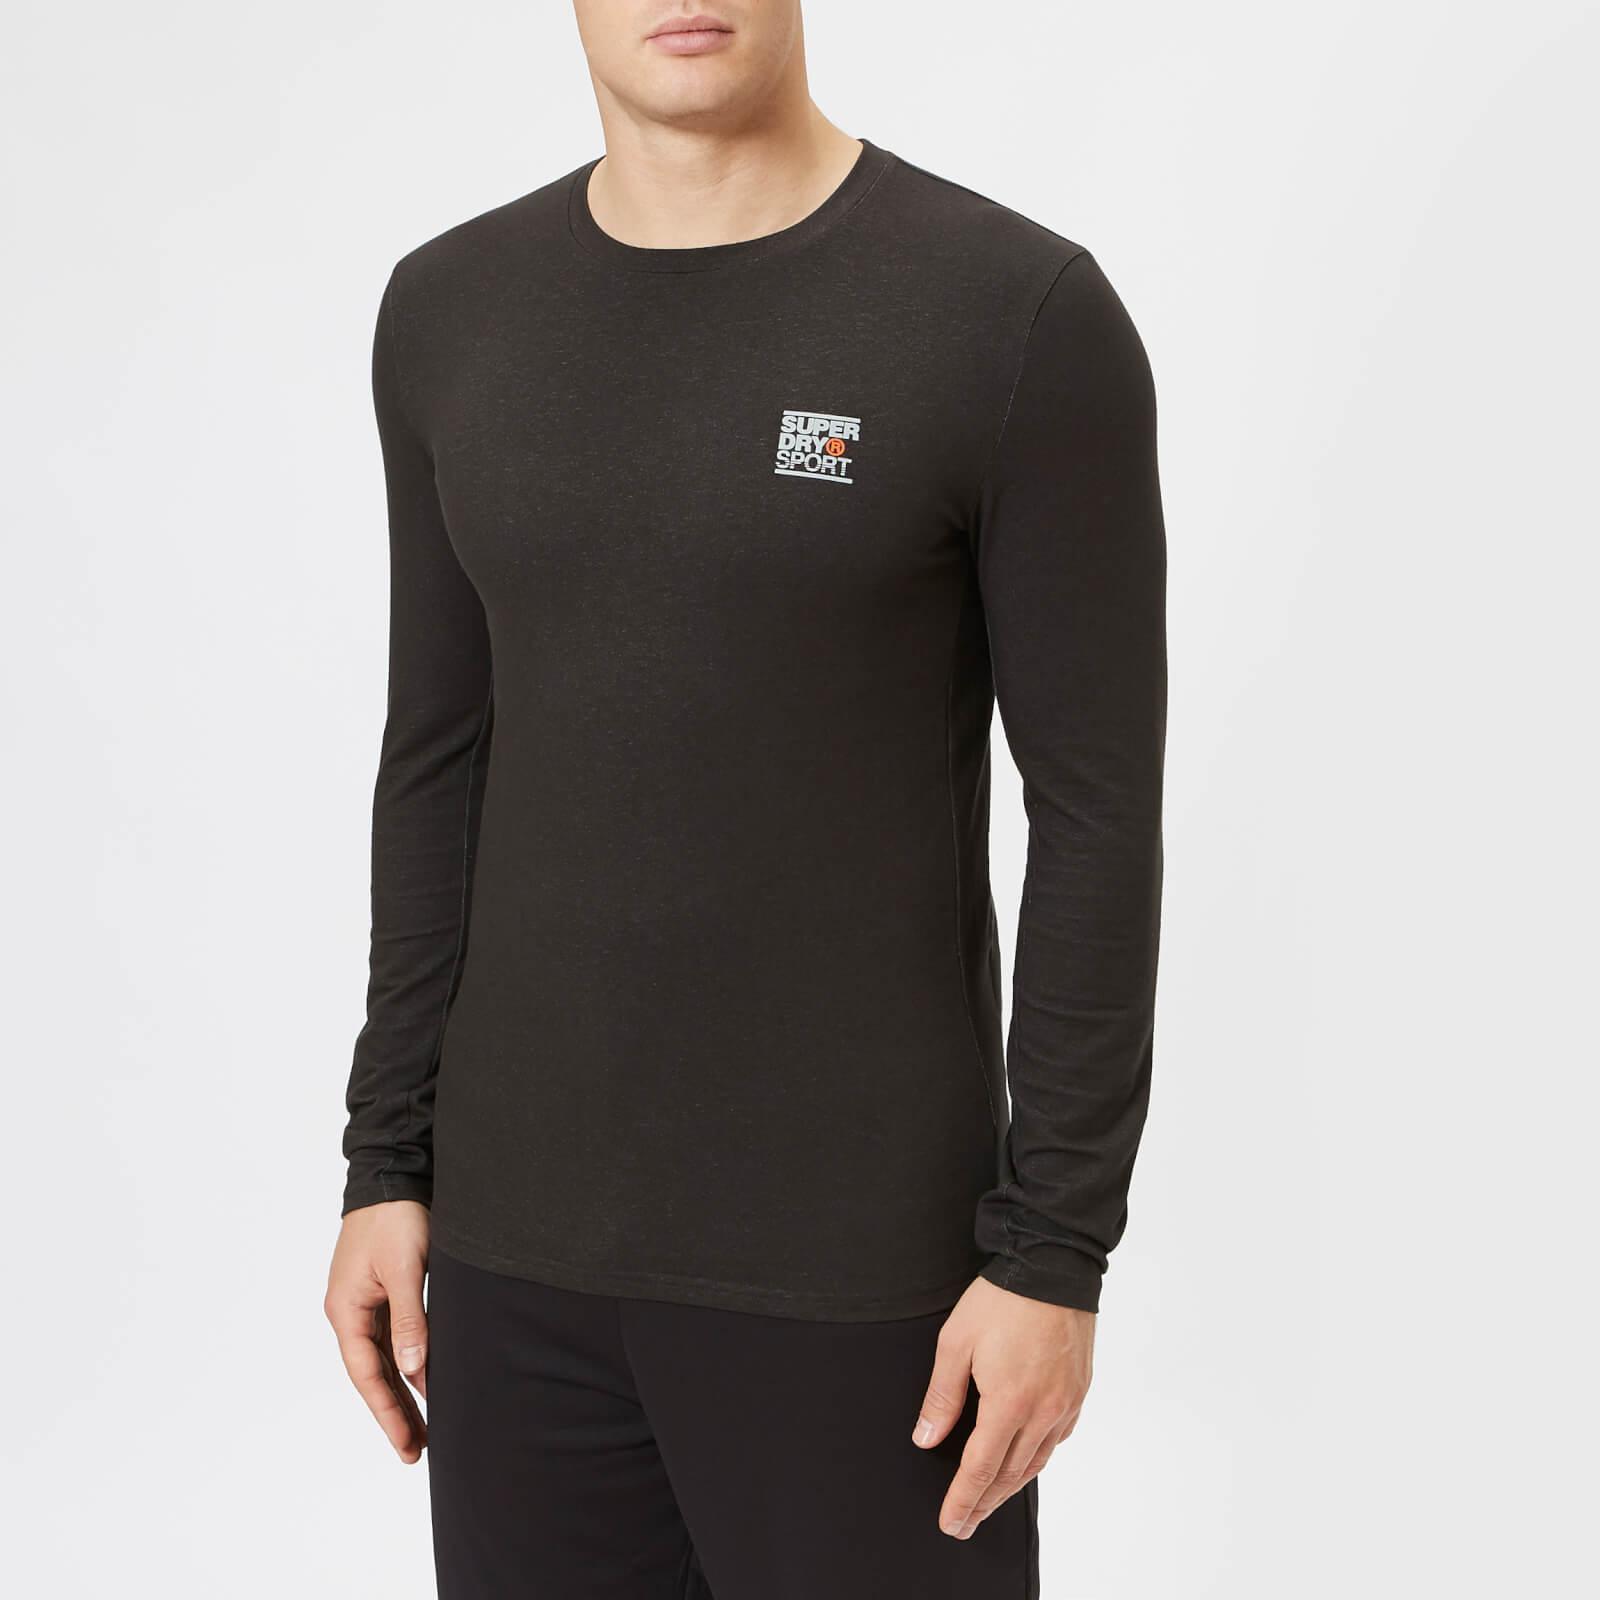 Superdry Sport Men's Core Long Sleeve Sign Off T-Shirt - Black - L - Black